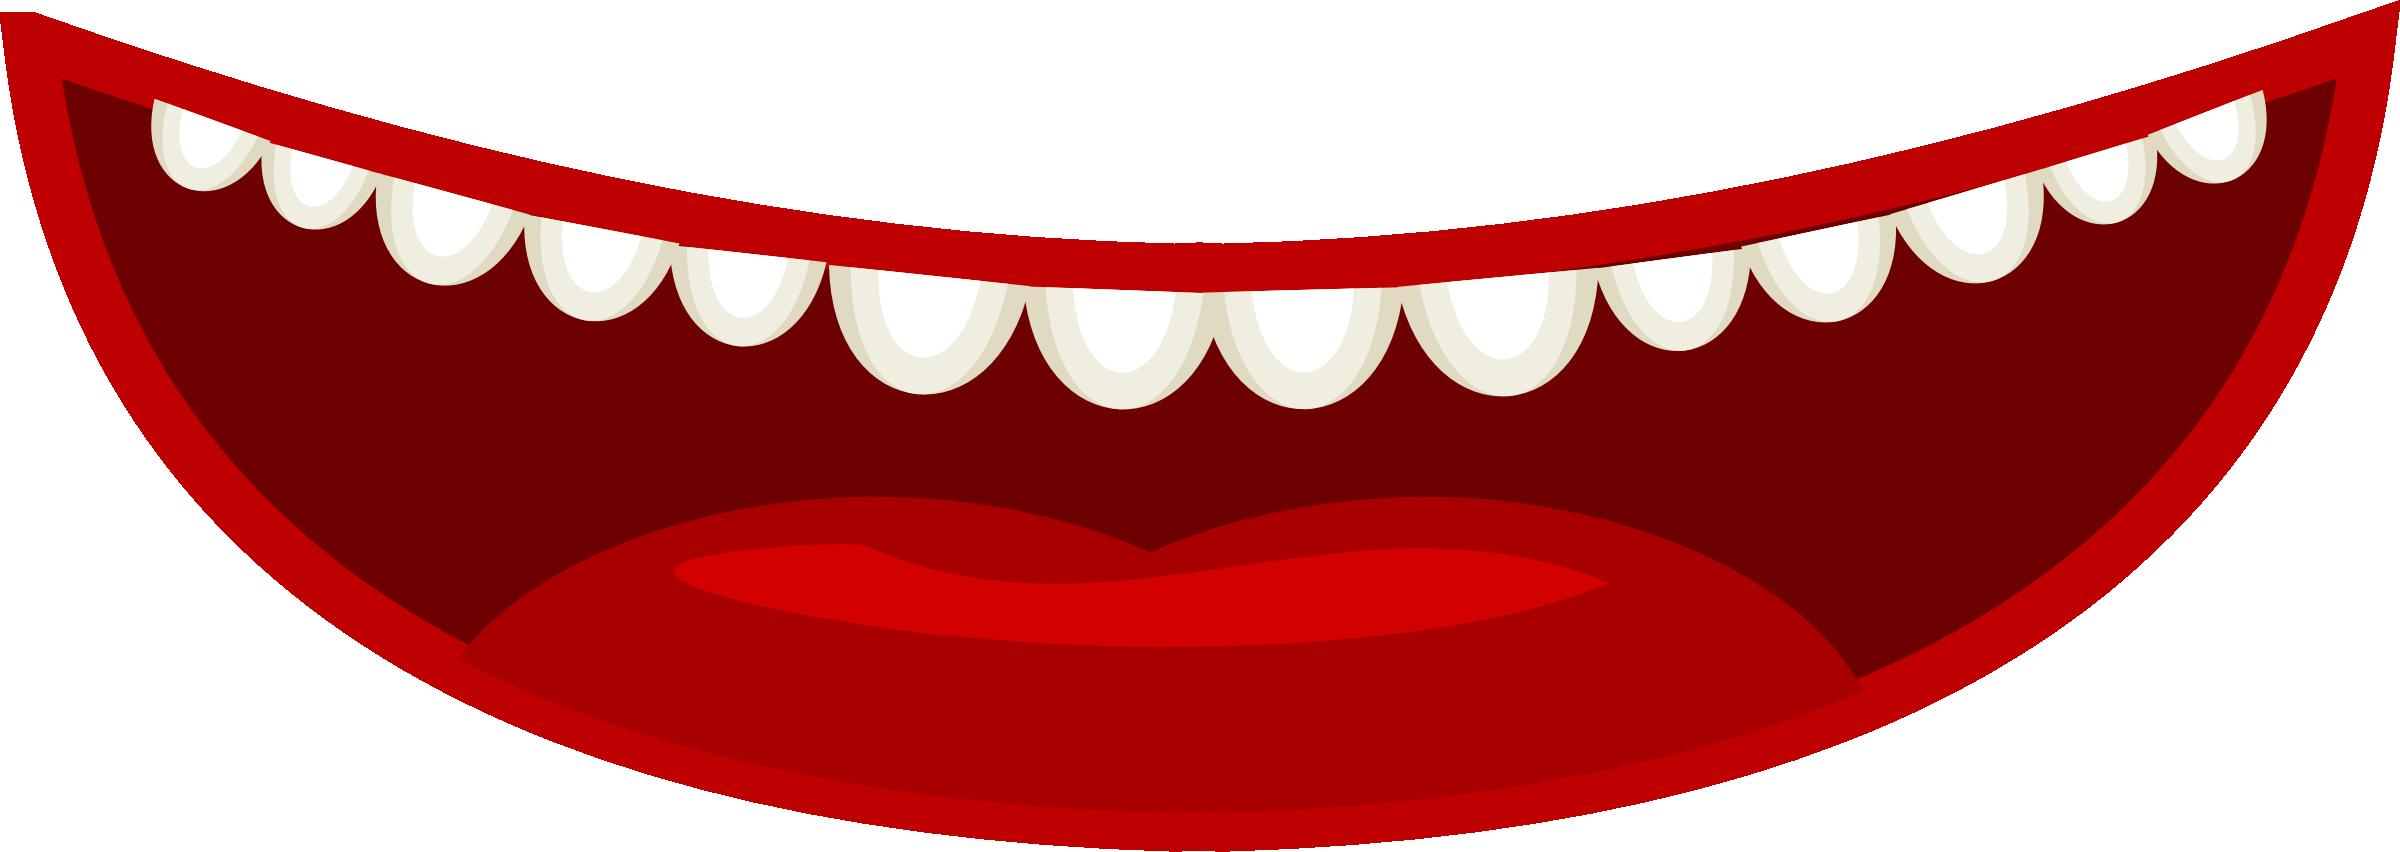 mouth clip art clipart panda free clipart images clip art mouth and nose clip art mouth and nose